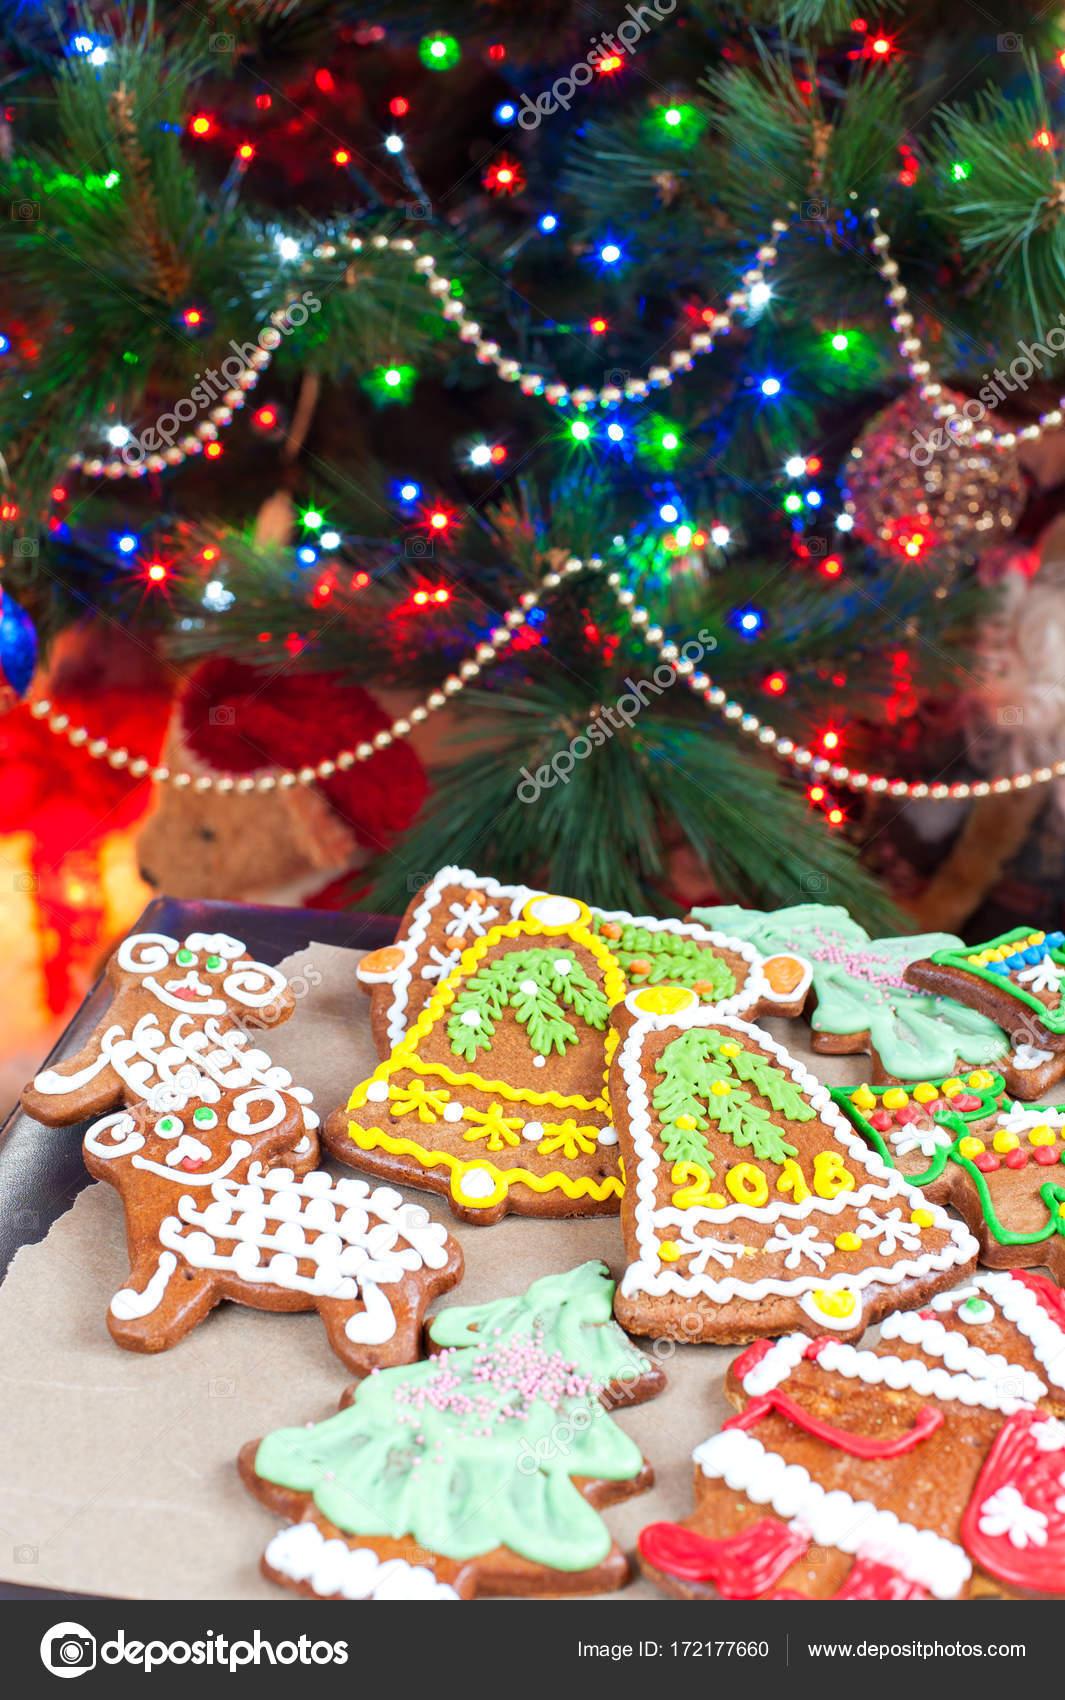 Homemade Christmas Tree Shape Gingerbread Cookies On Illuminated